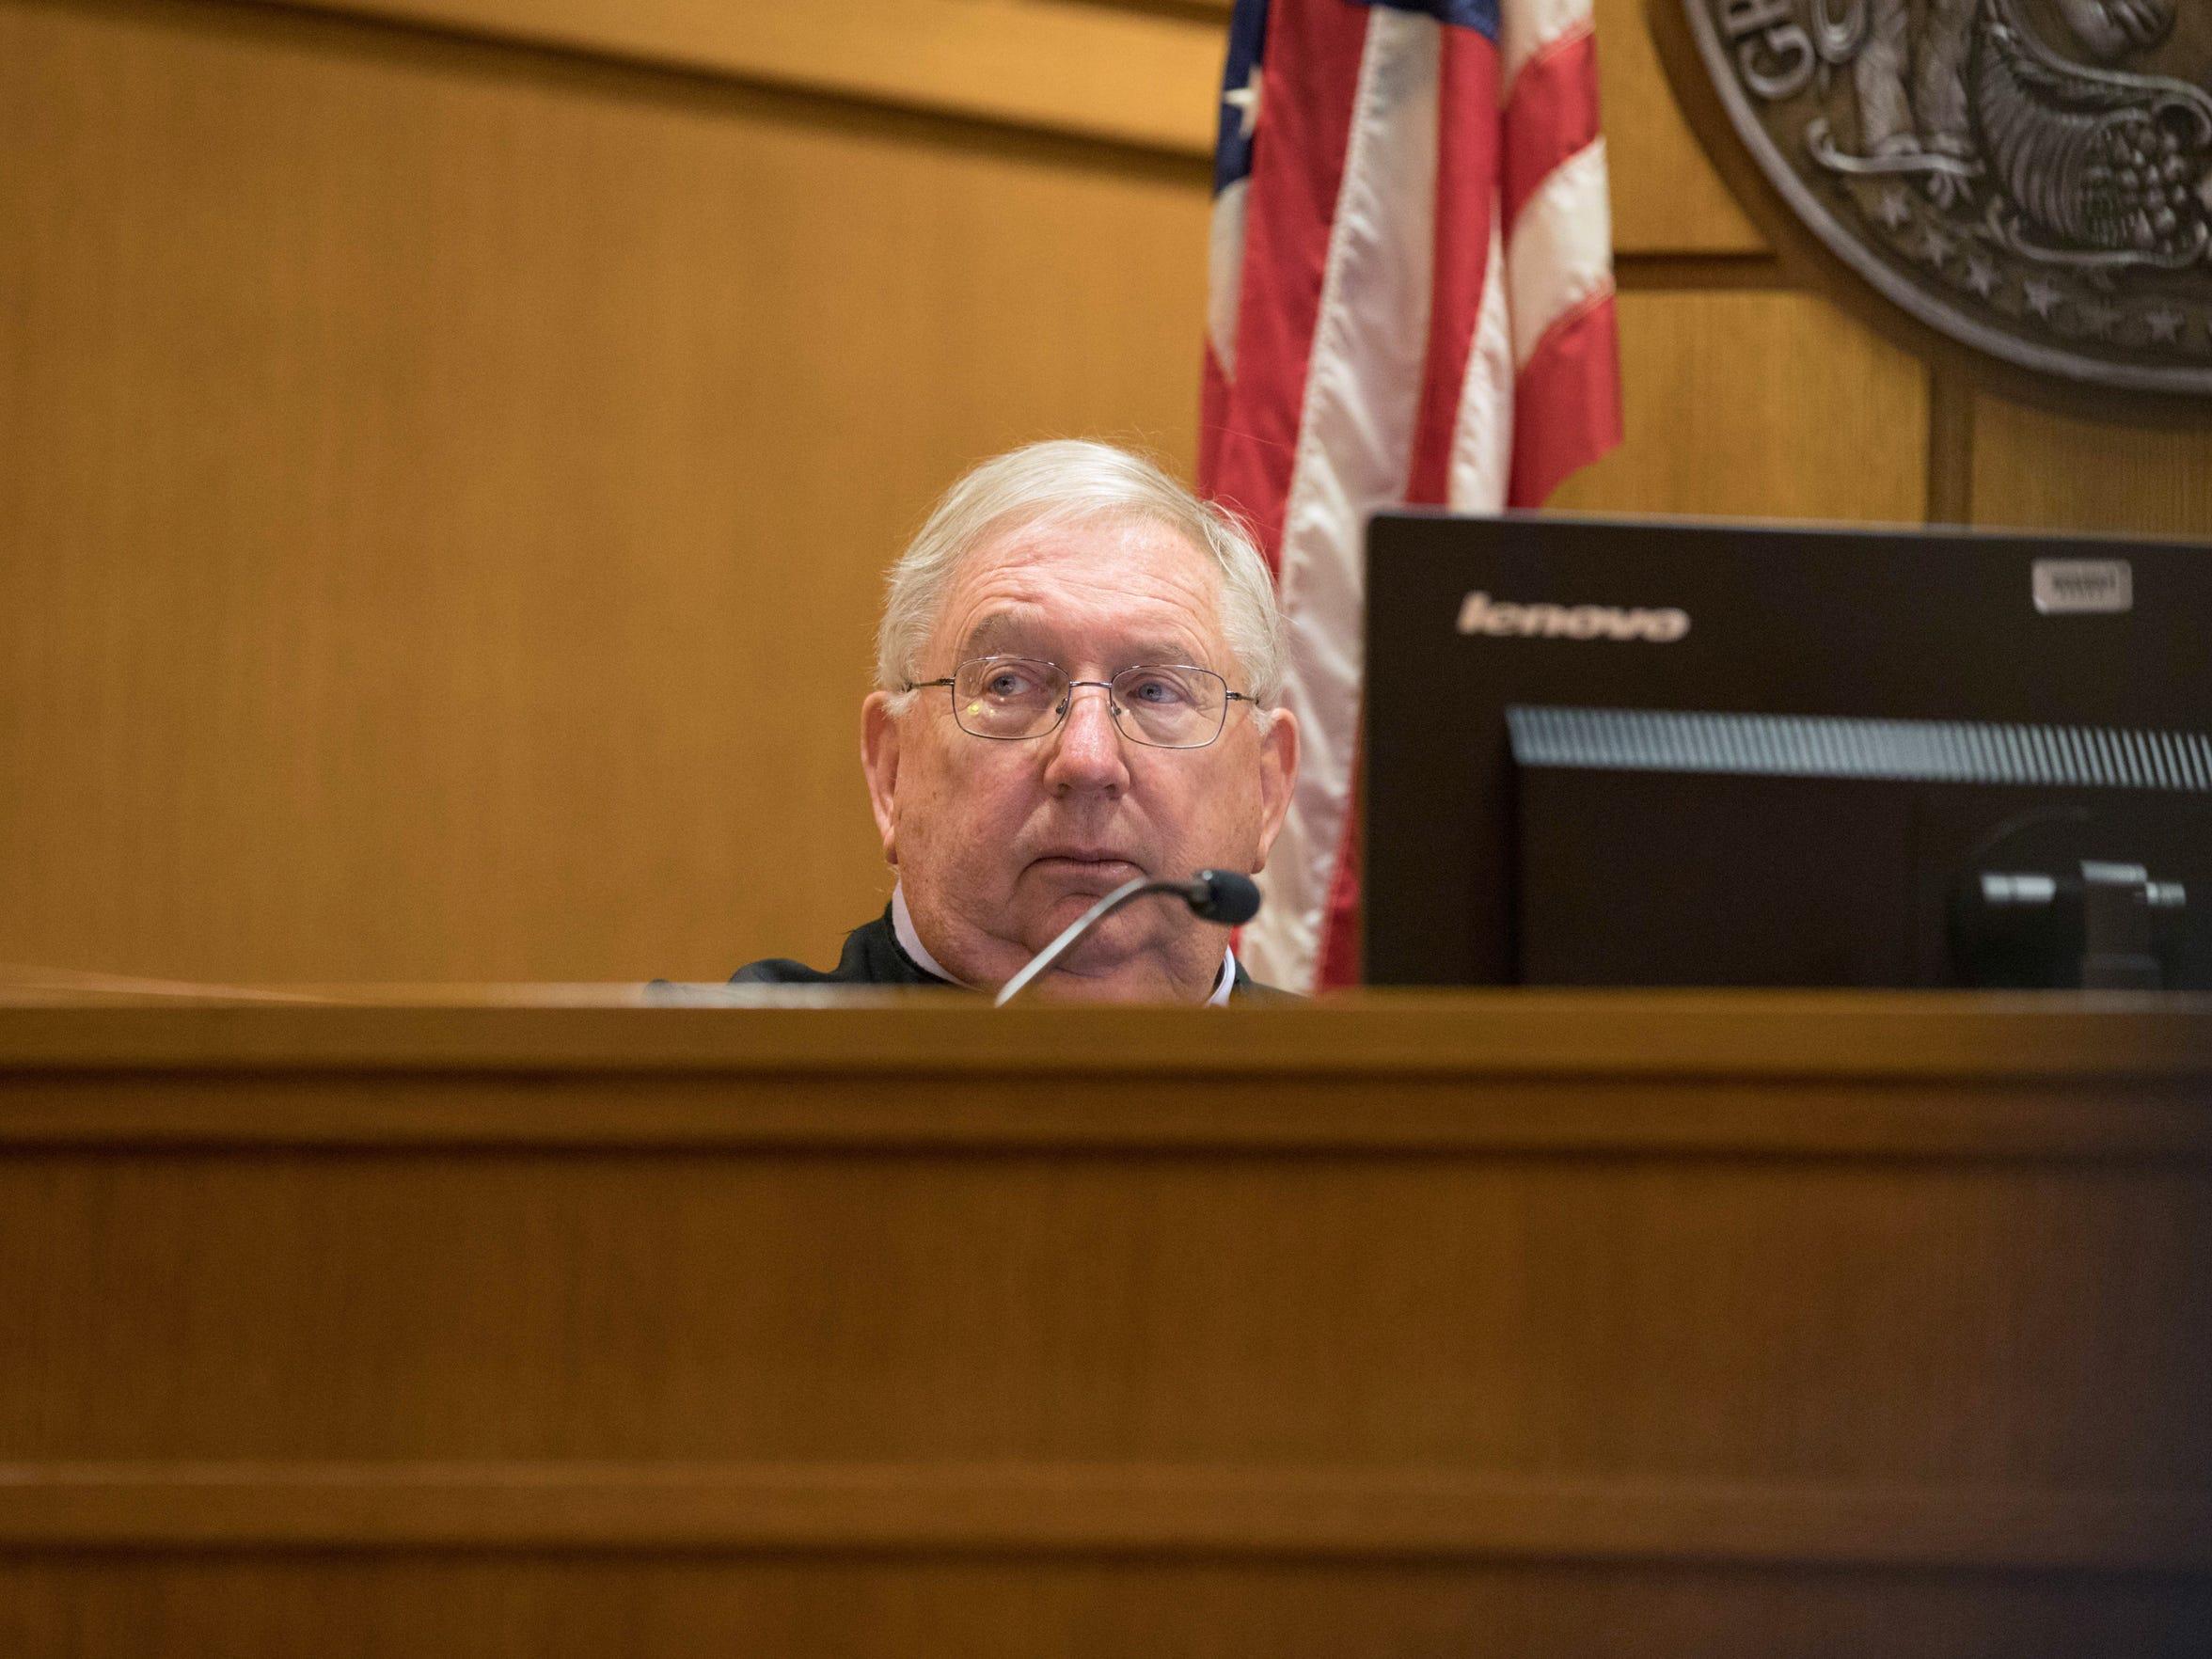 Retired Dane County Circuit Judge Daniel Moeser hears